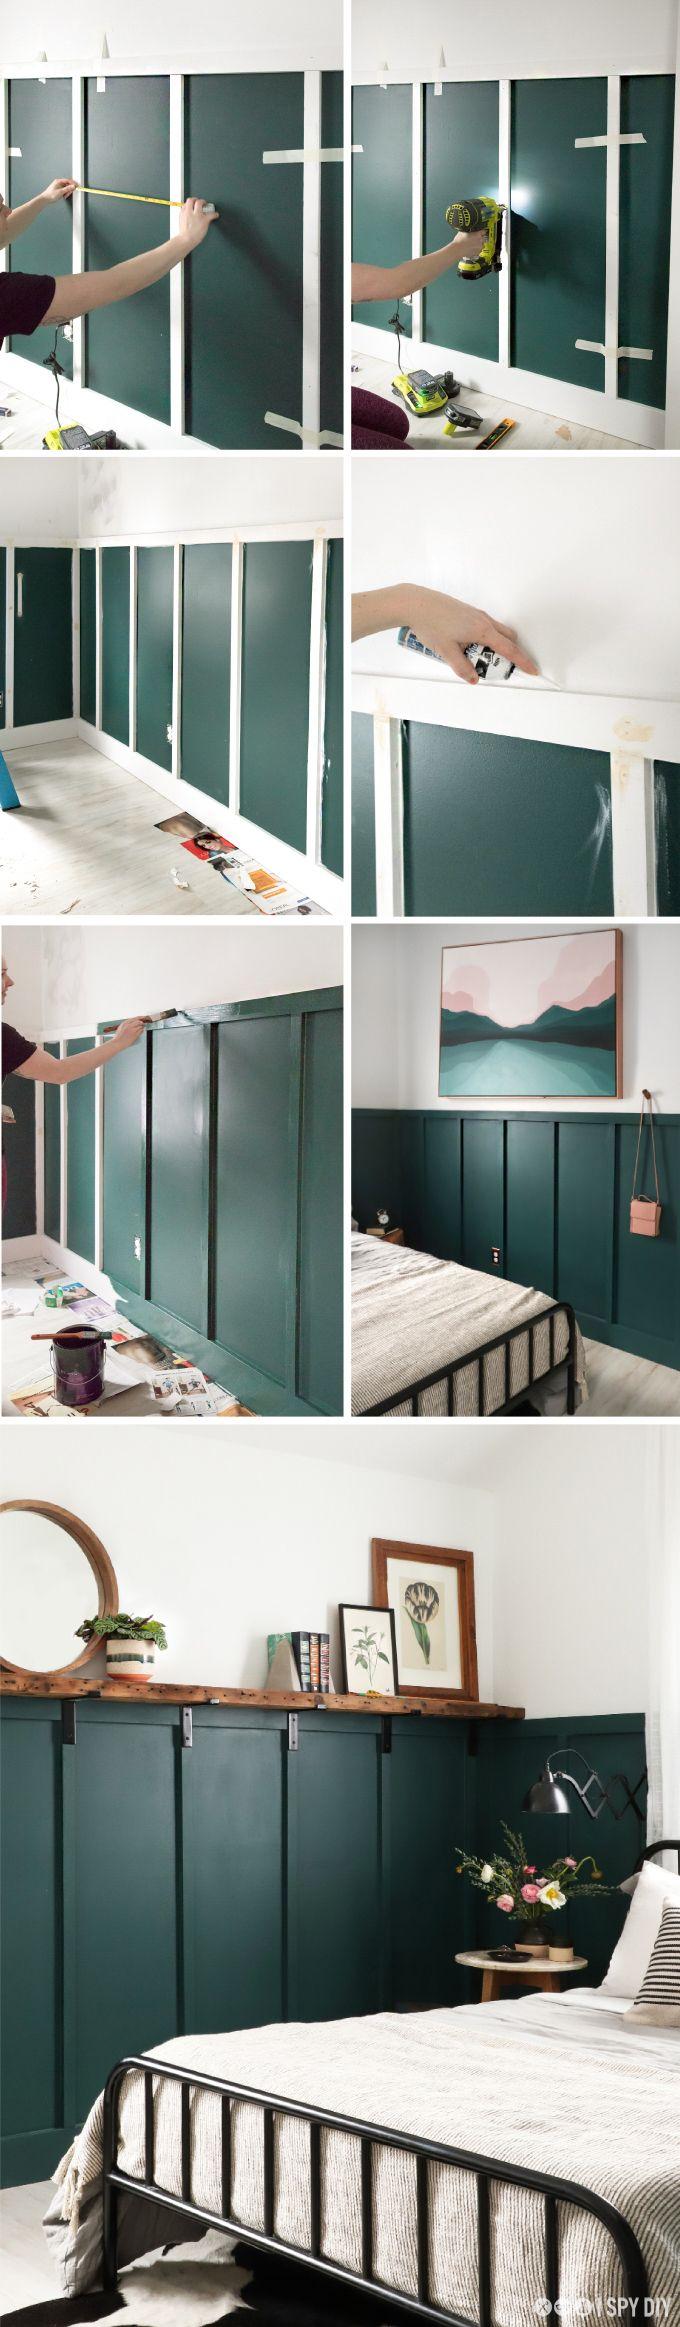 » DIY STEP-BY-STEP | Board & Batten Wall